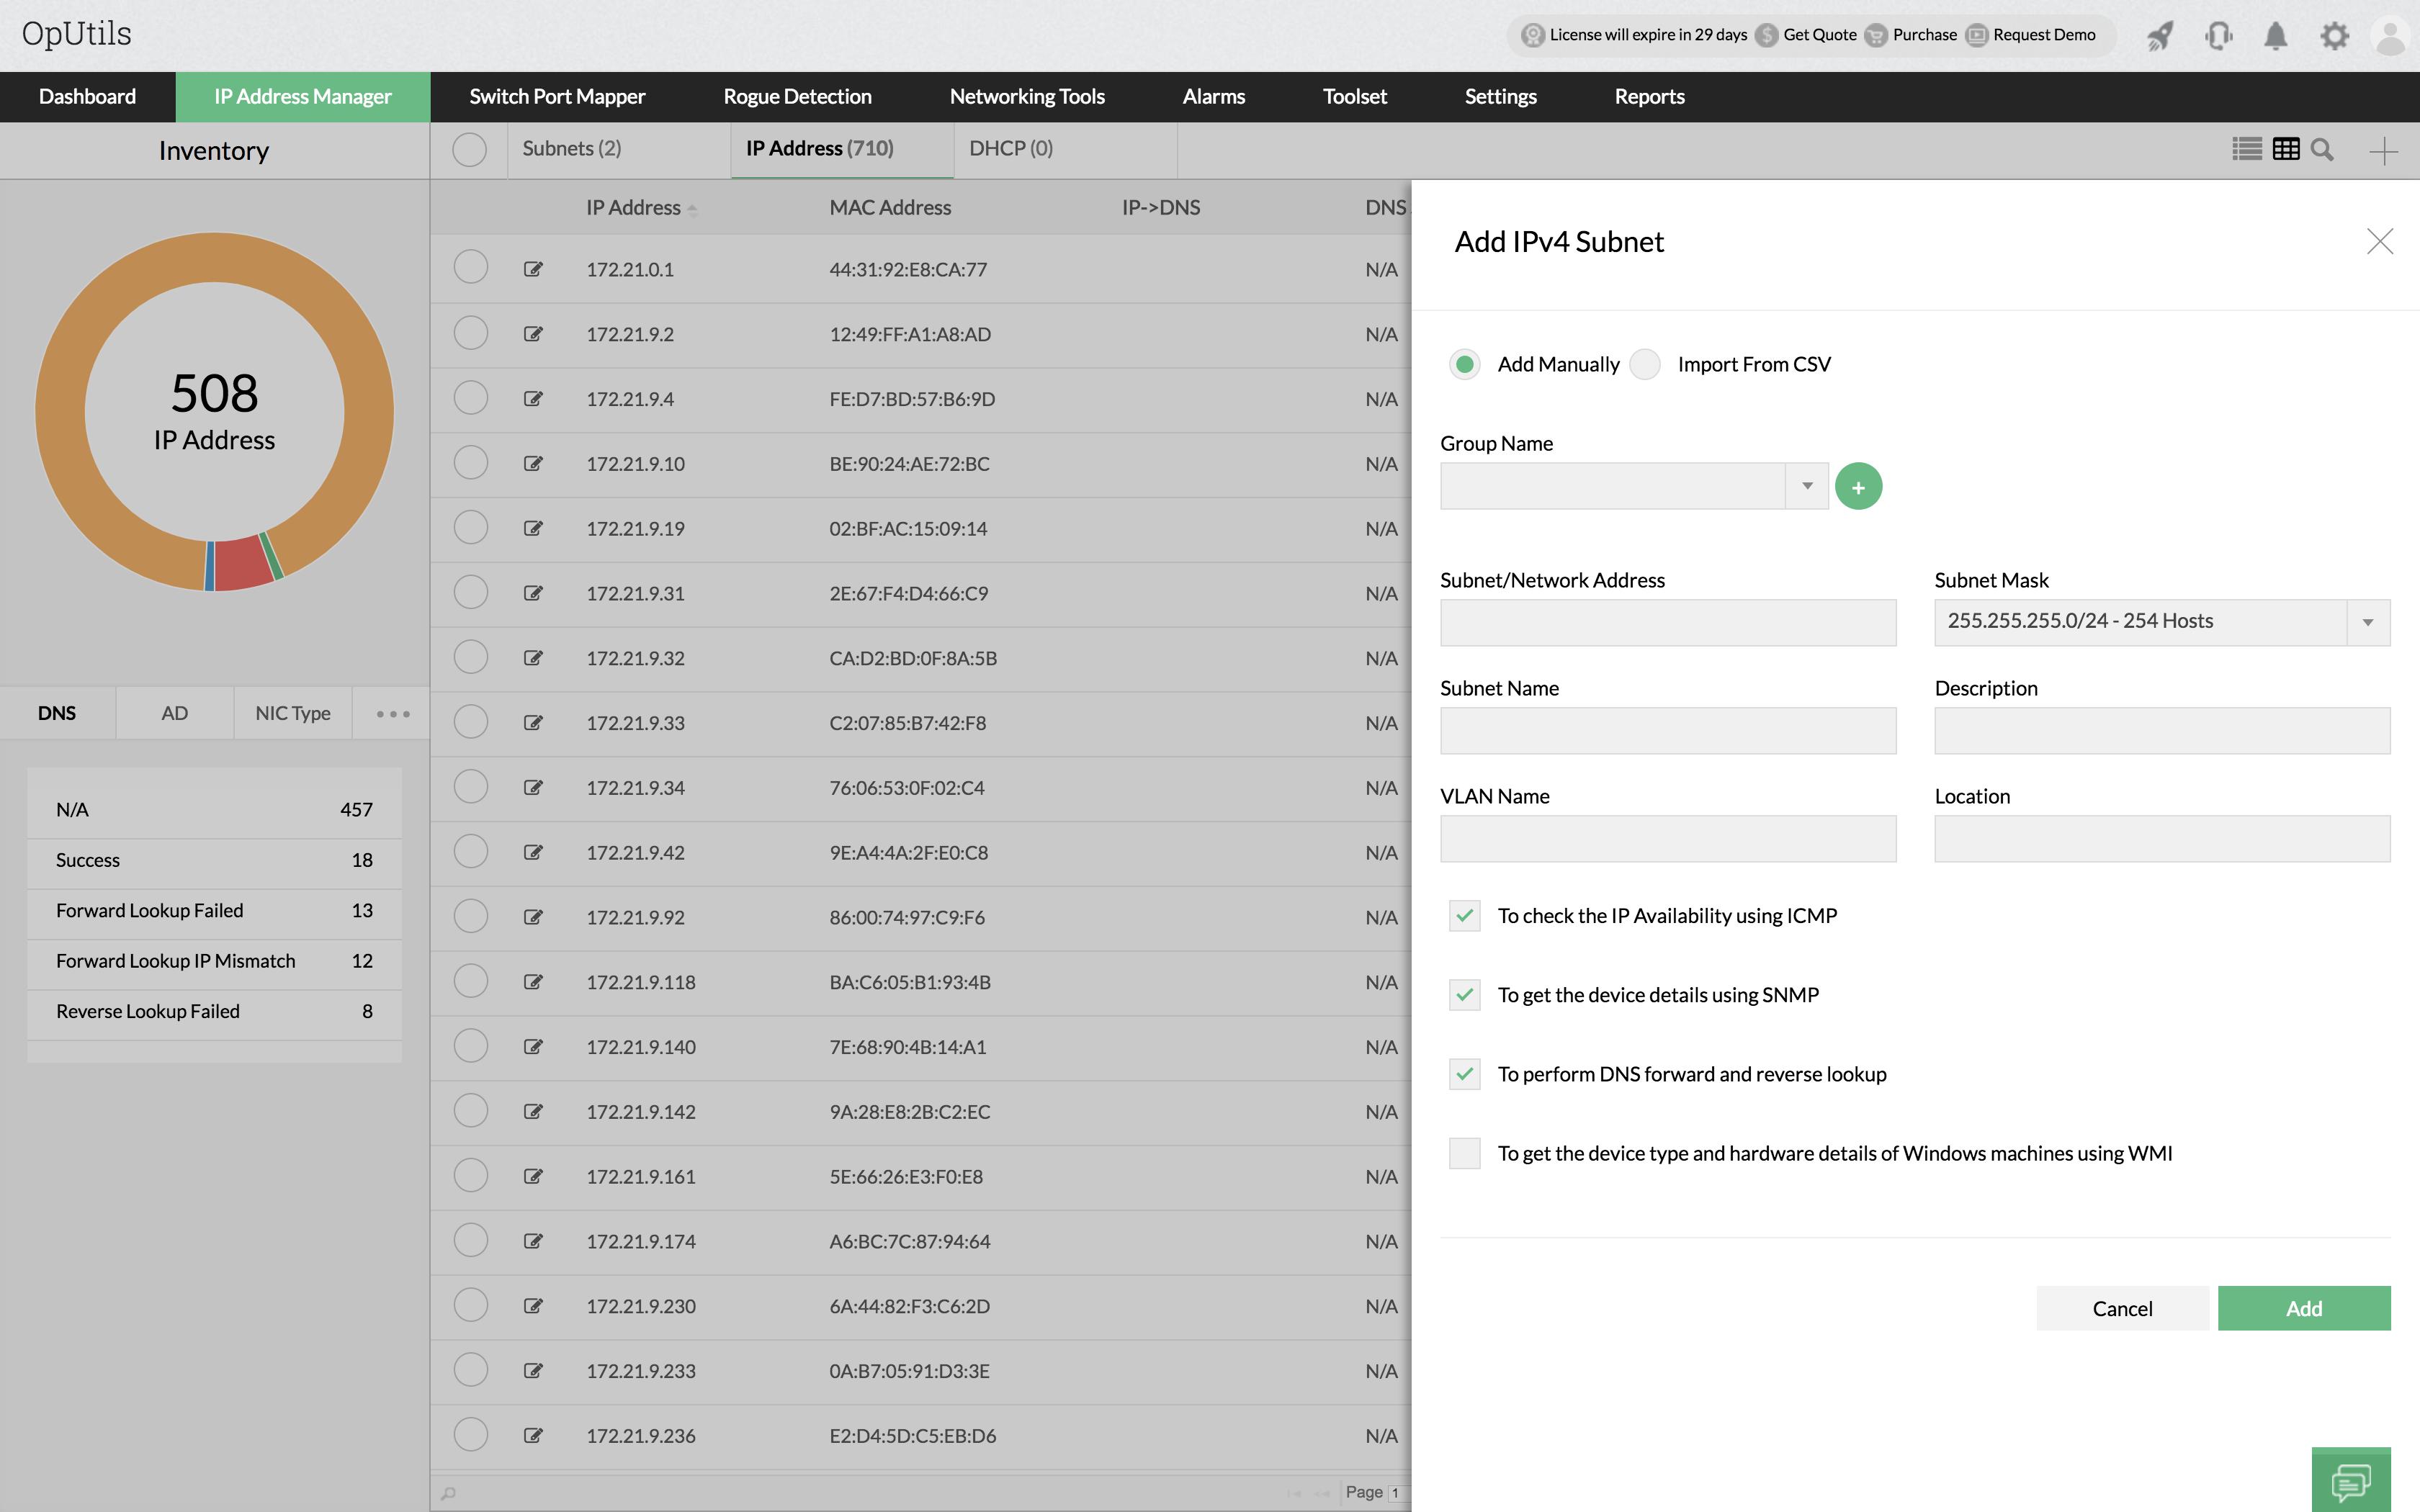 Advanced IP Scanning - ManageEngine OpUtils